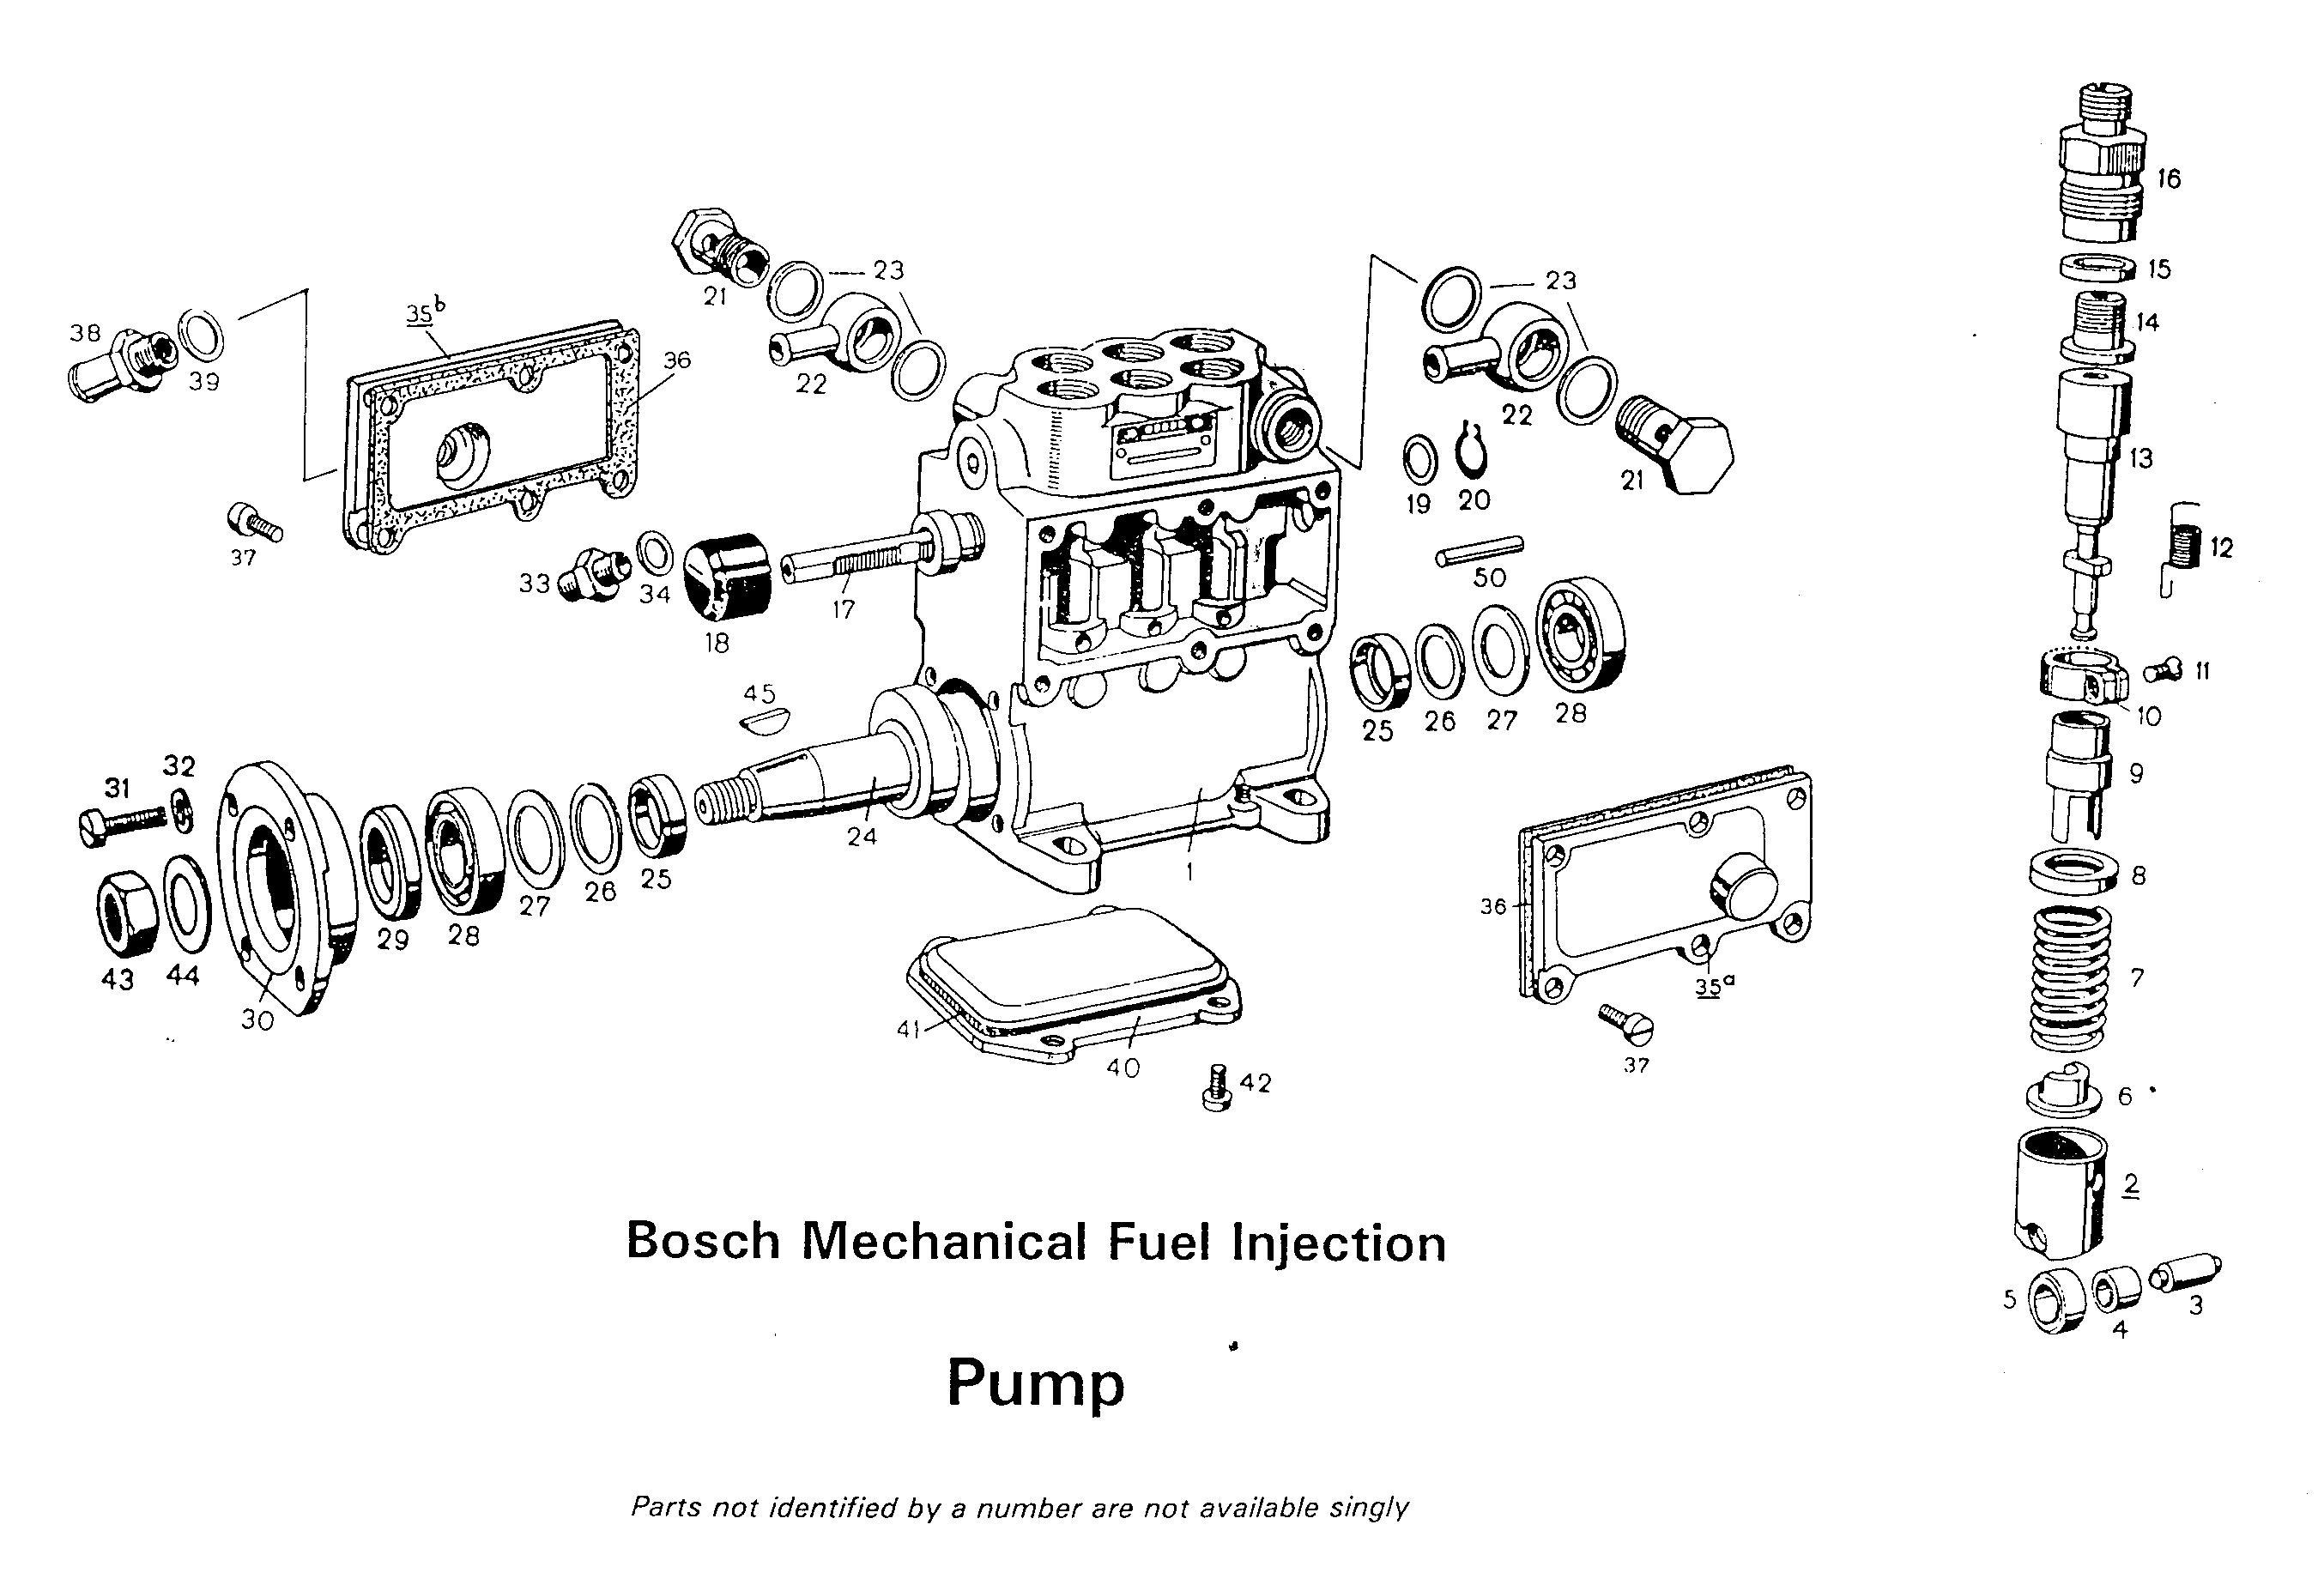 7 3 Powerstroke Fuel Pump Leak, 7, Free Engine Image For